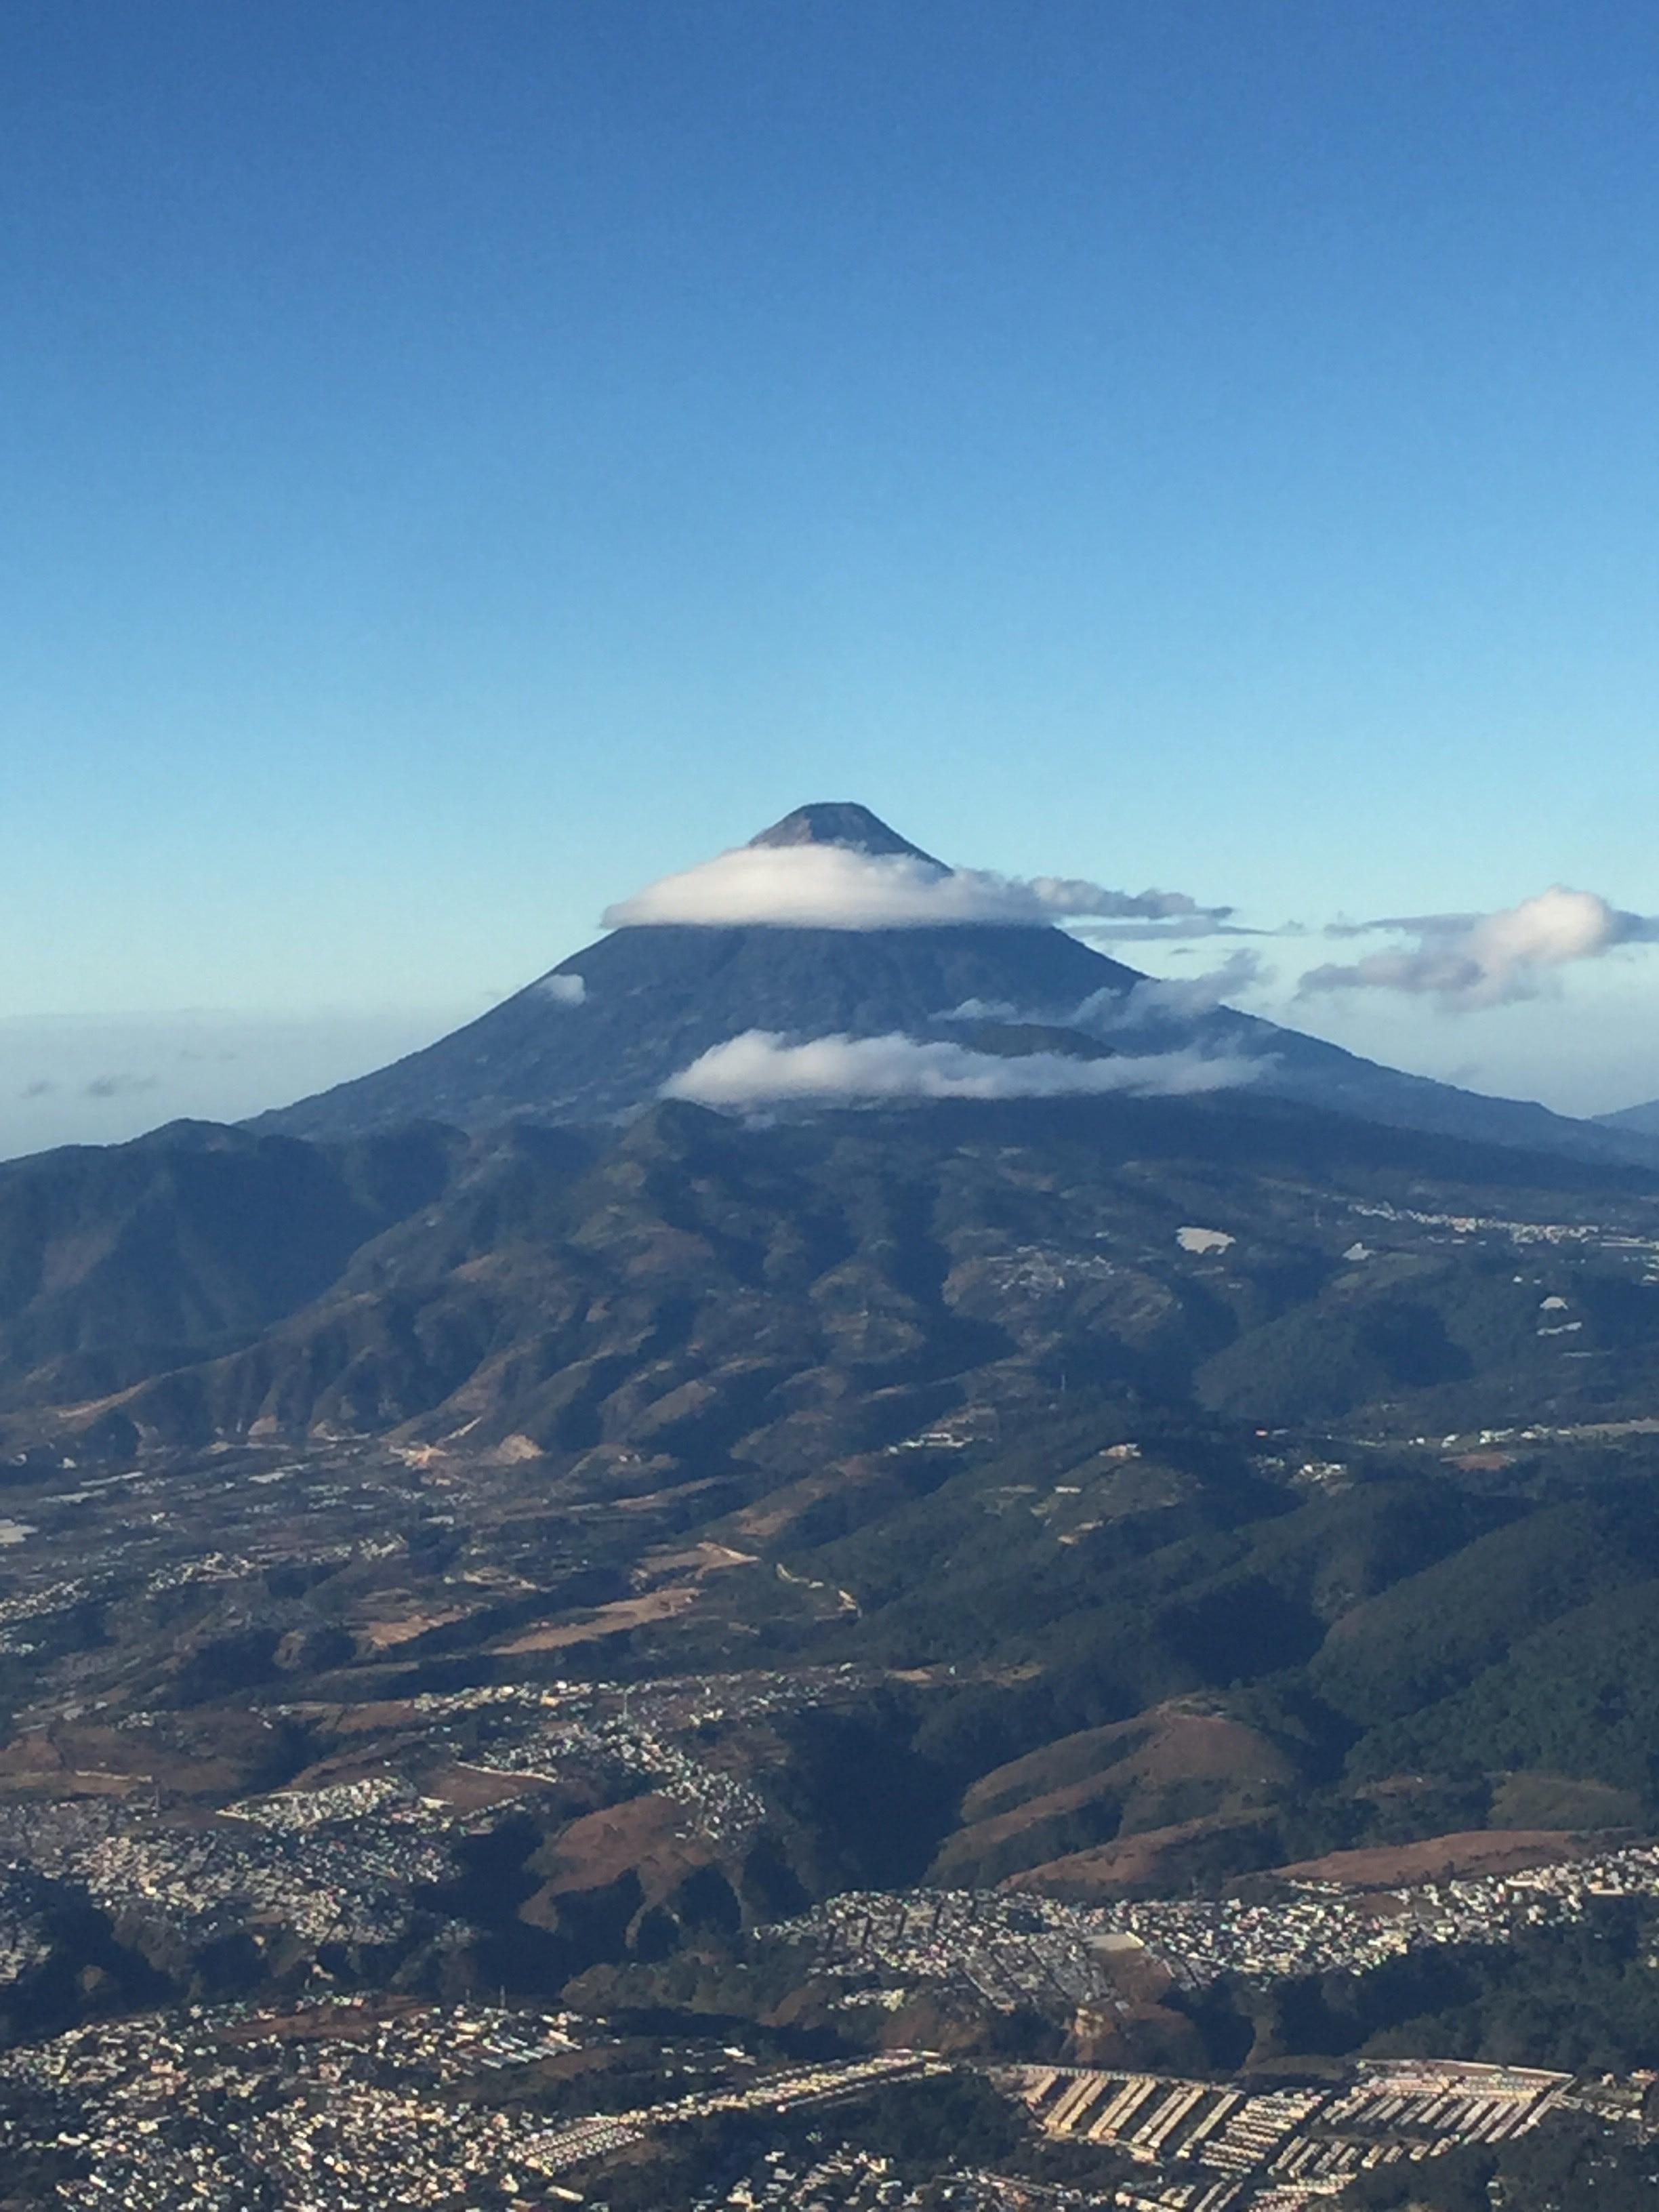 Volcan de Agua, Ciudad Vieja, Sacatepéquez, Guatemala